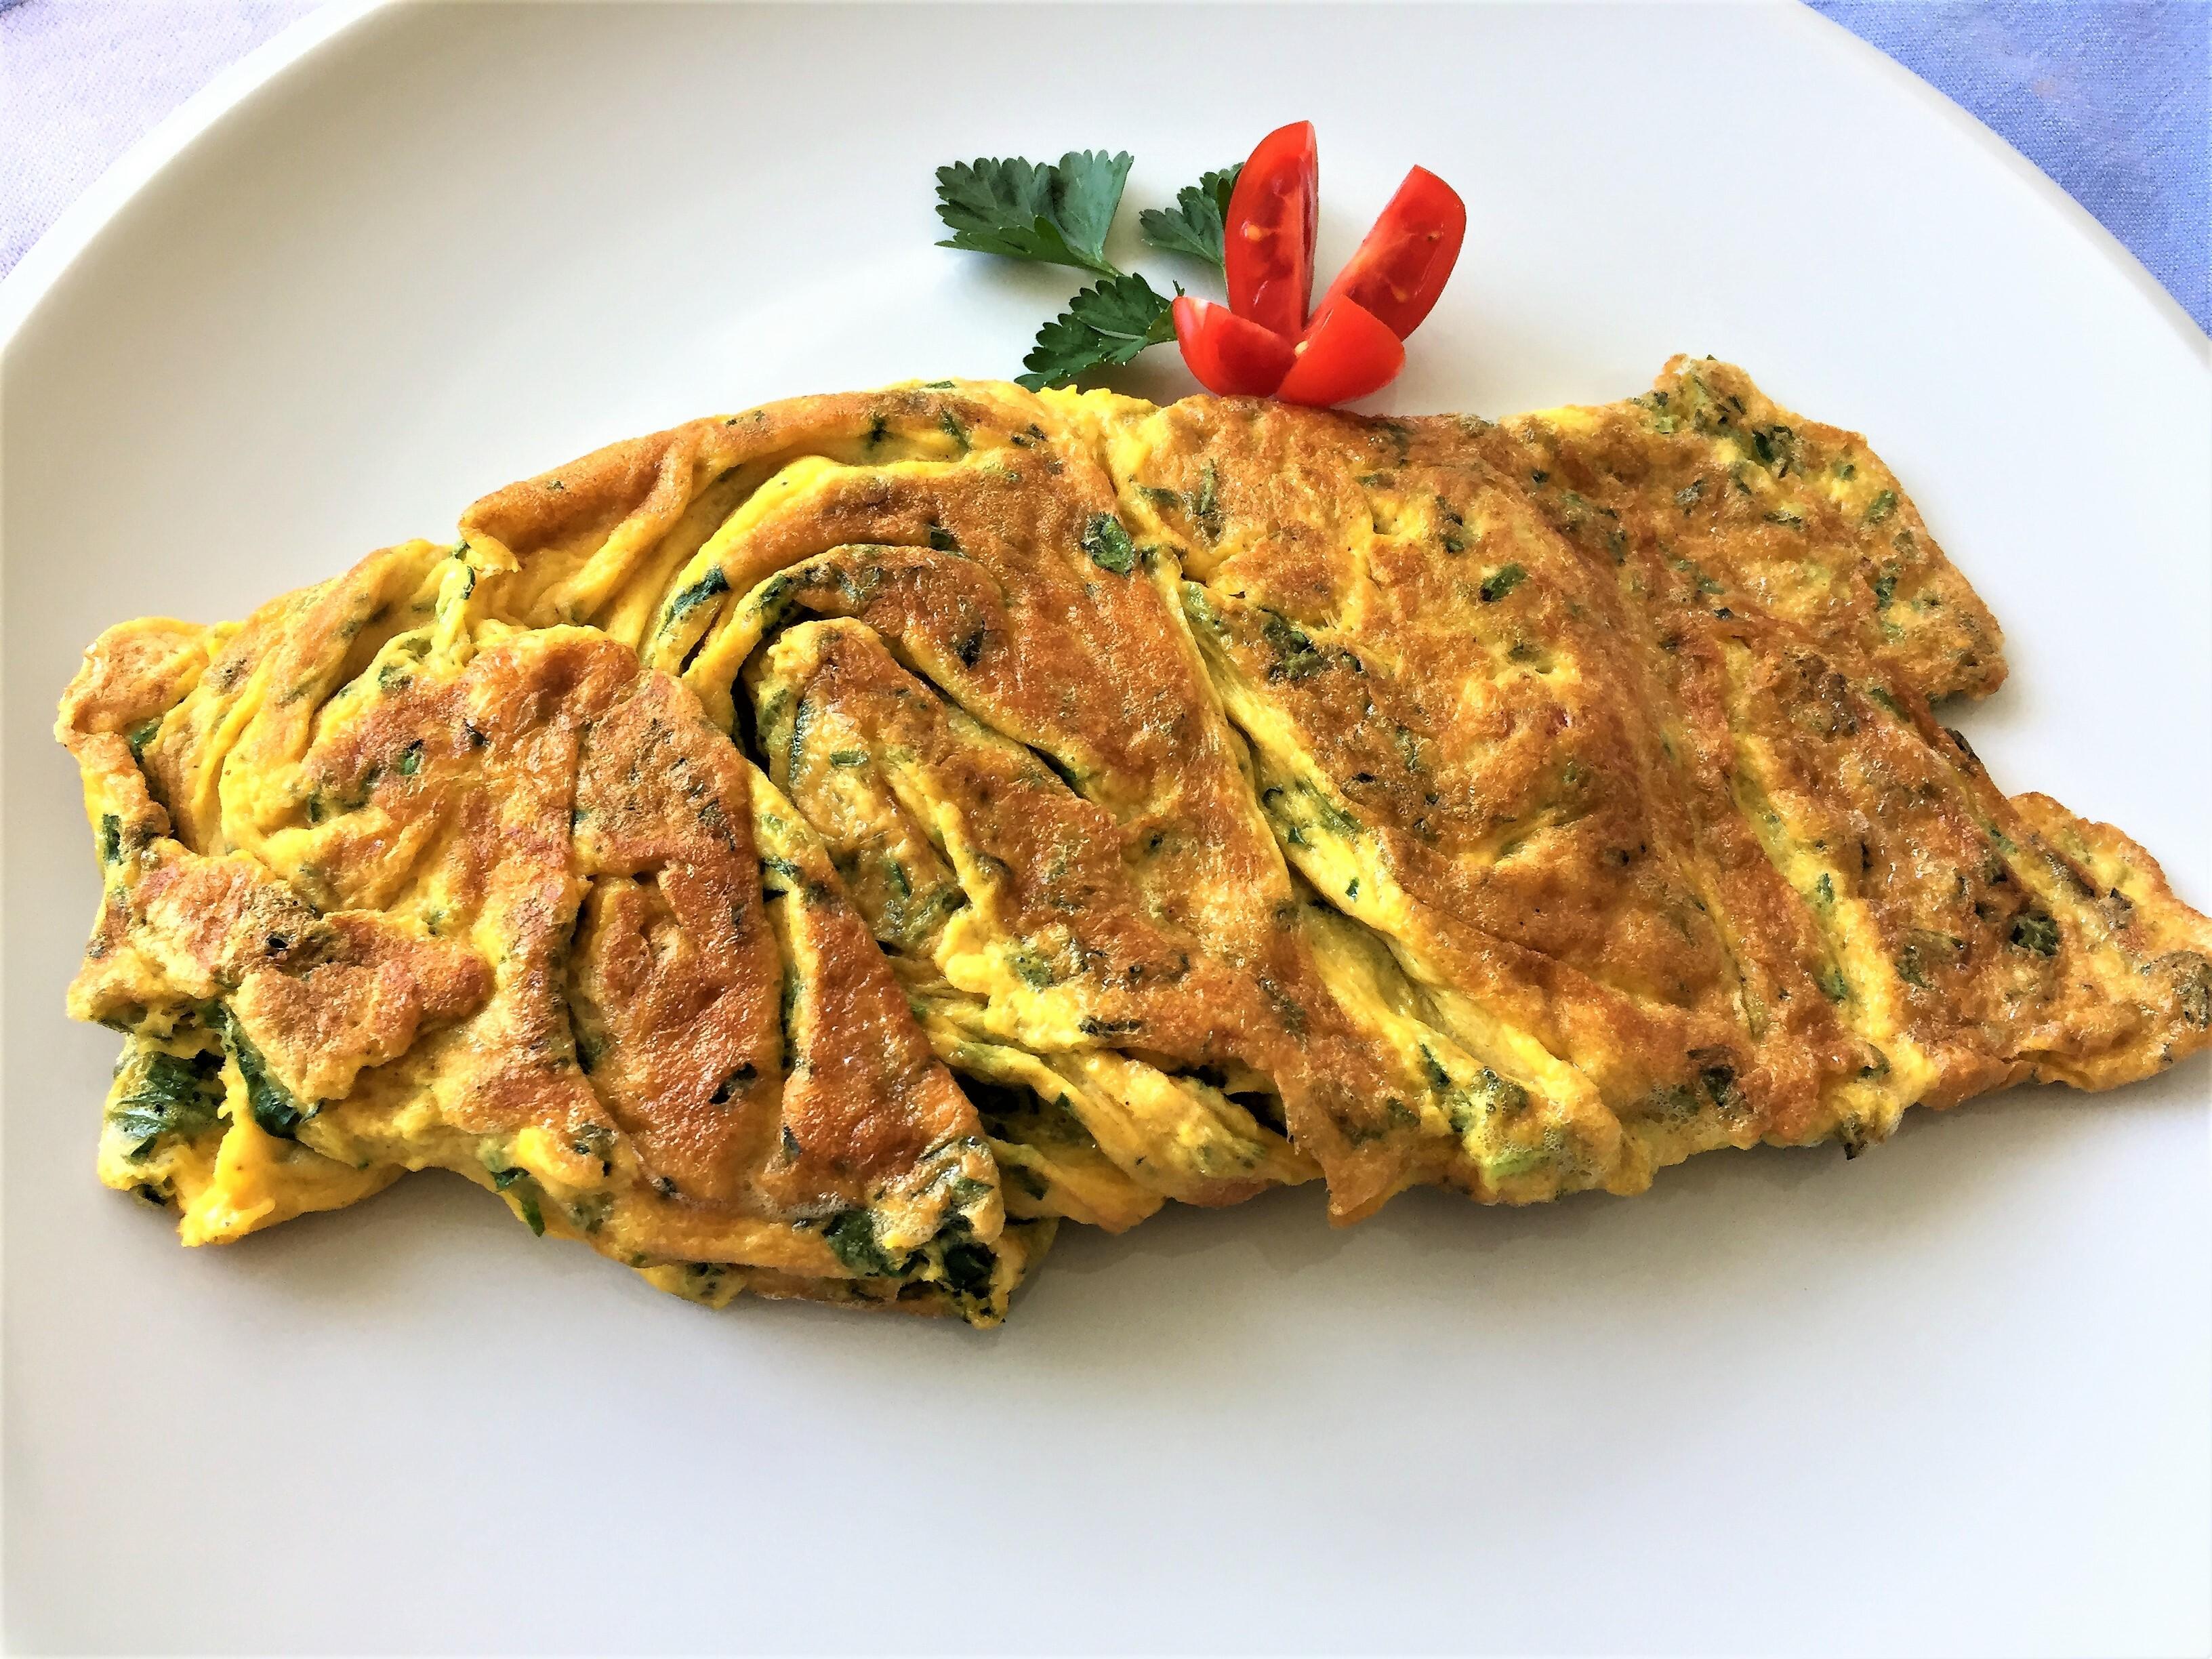 Omelette al silene, ripiena